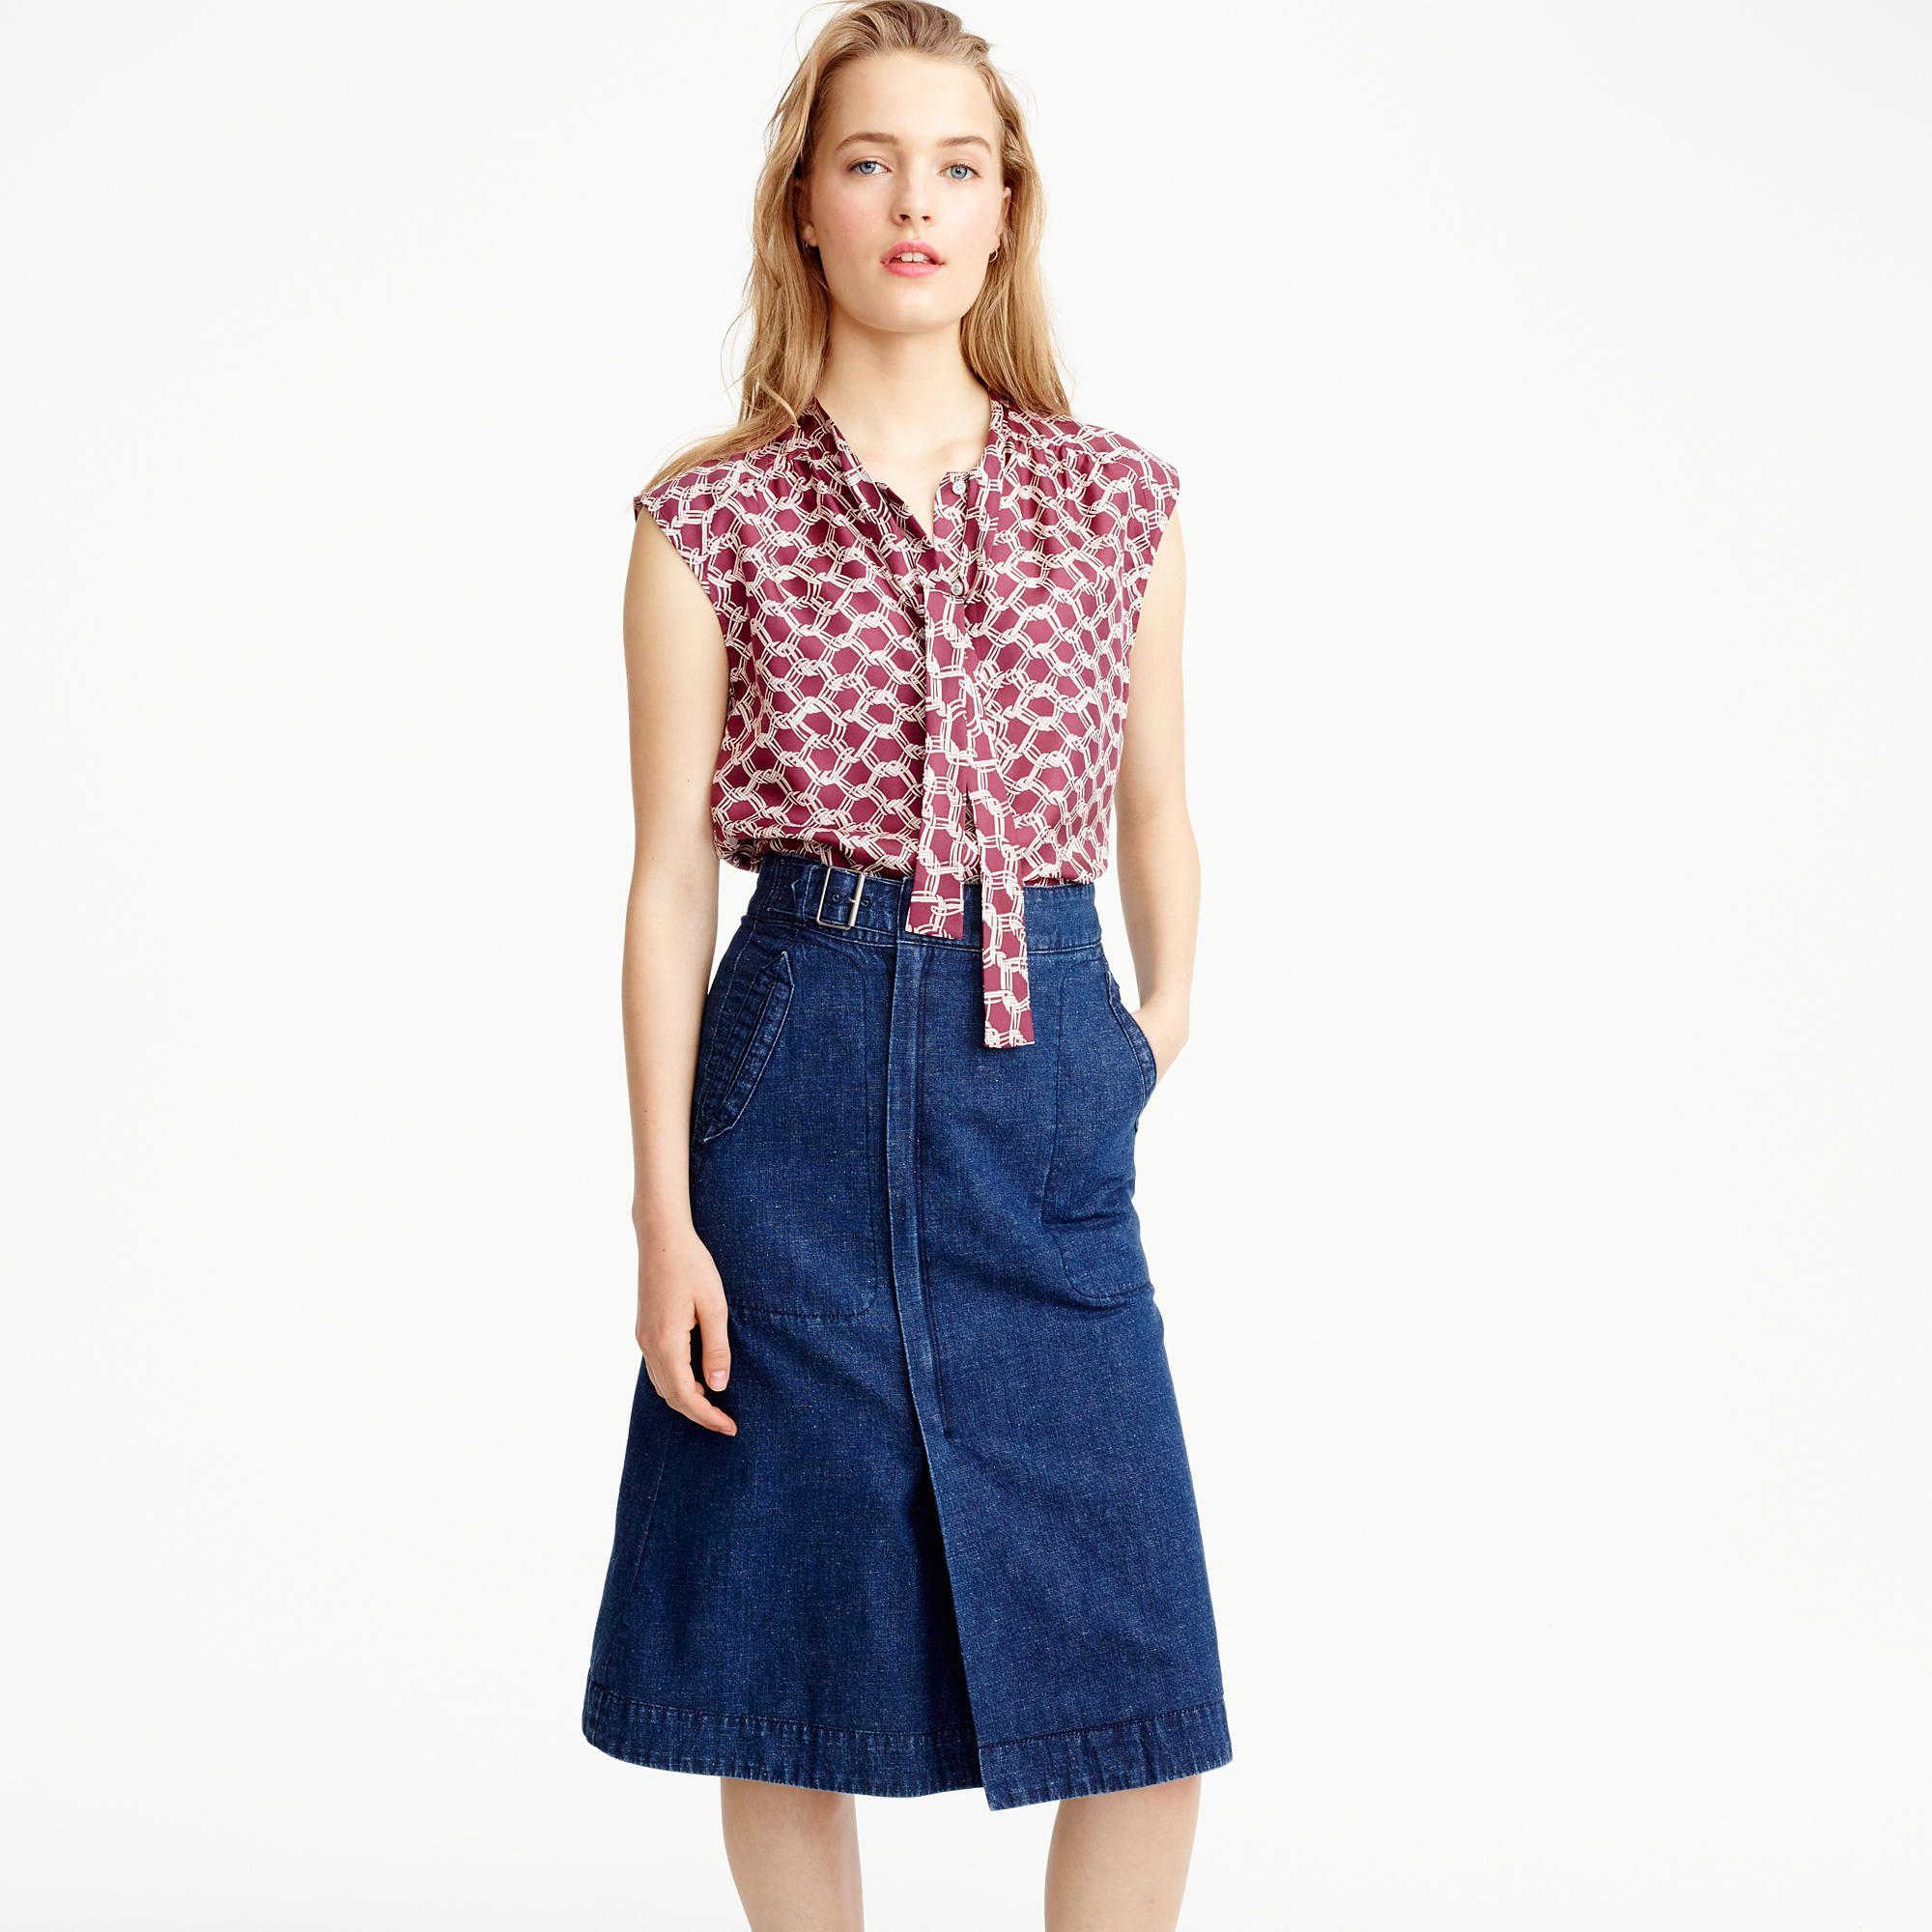 638d481966 Belted A-line skirt in denim : A-line/Midi | J.Crew | Summer 2017 ...